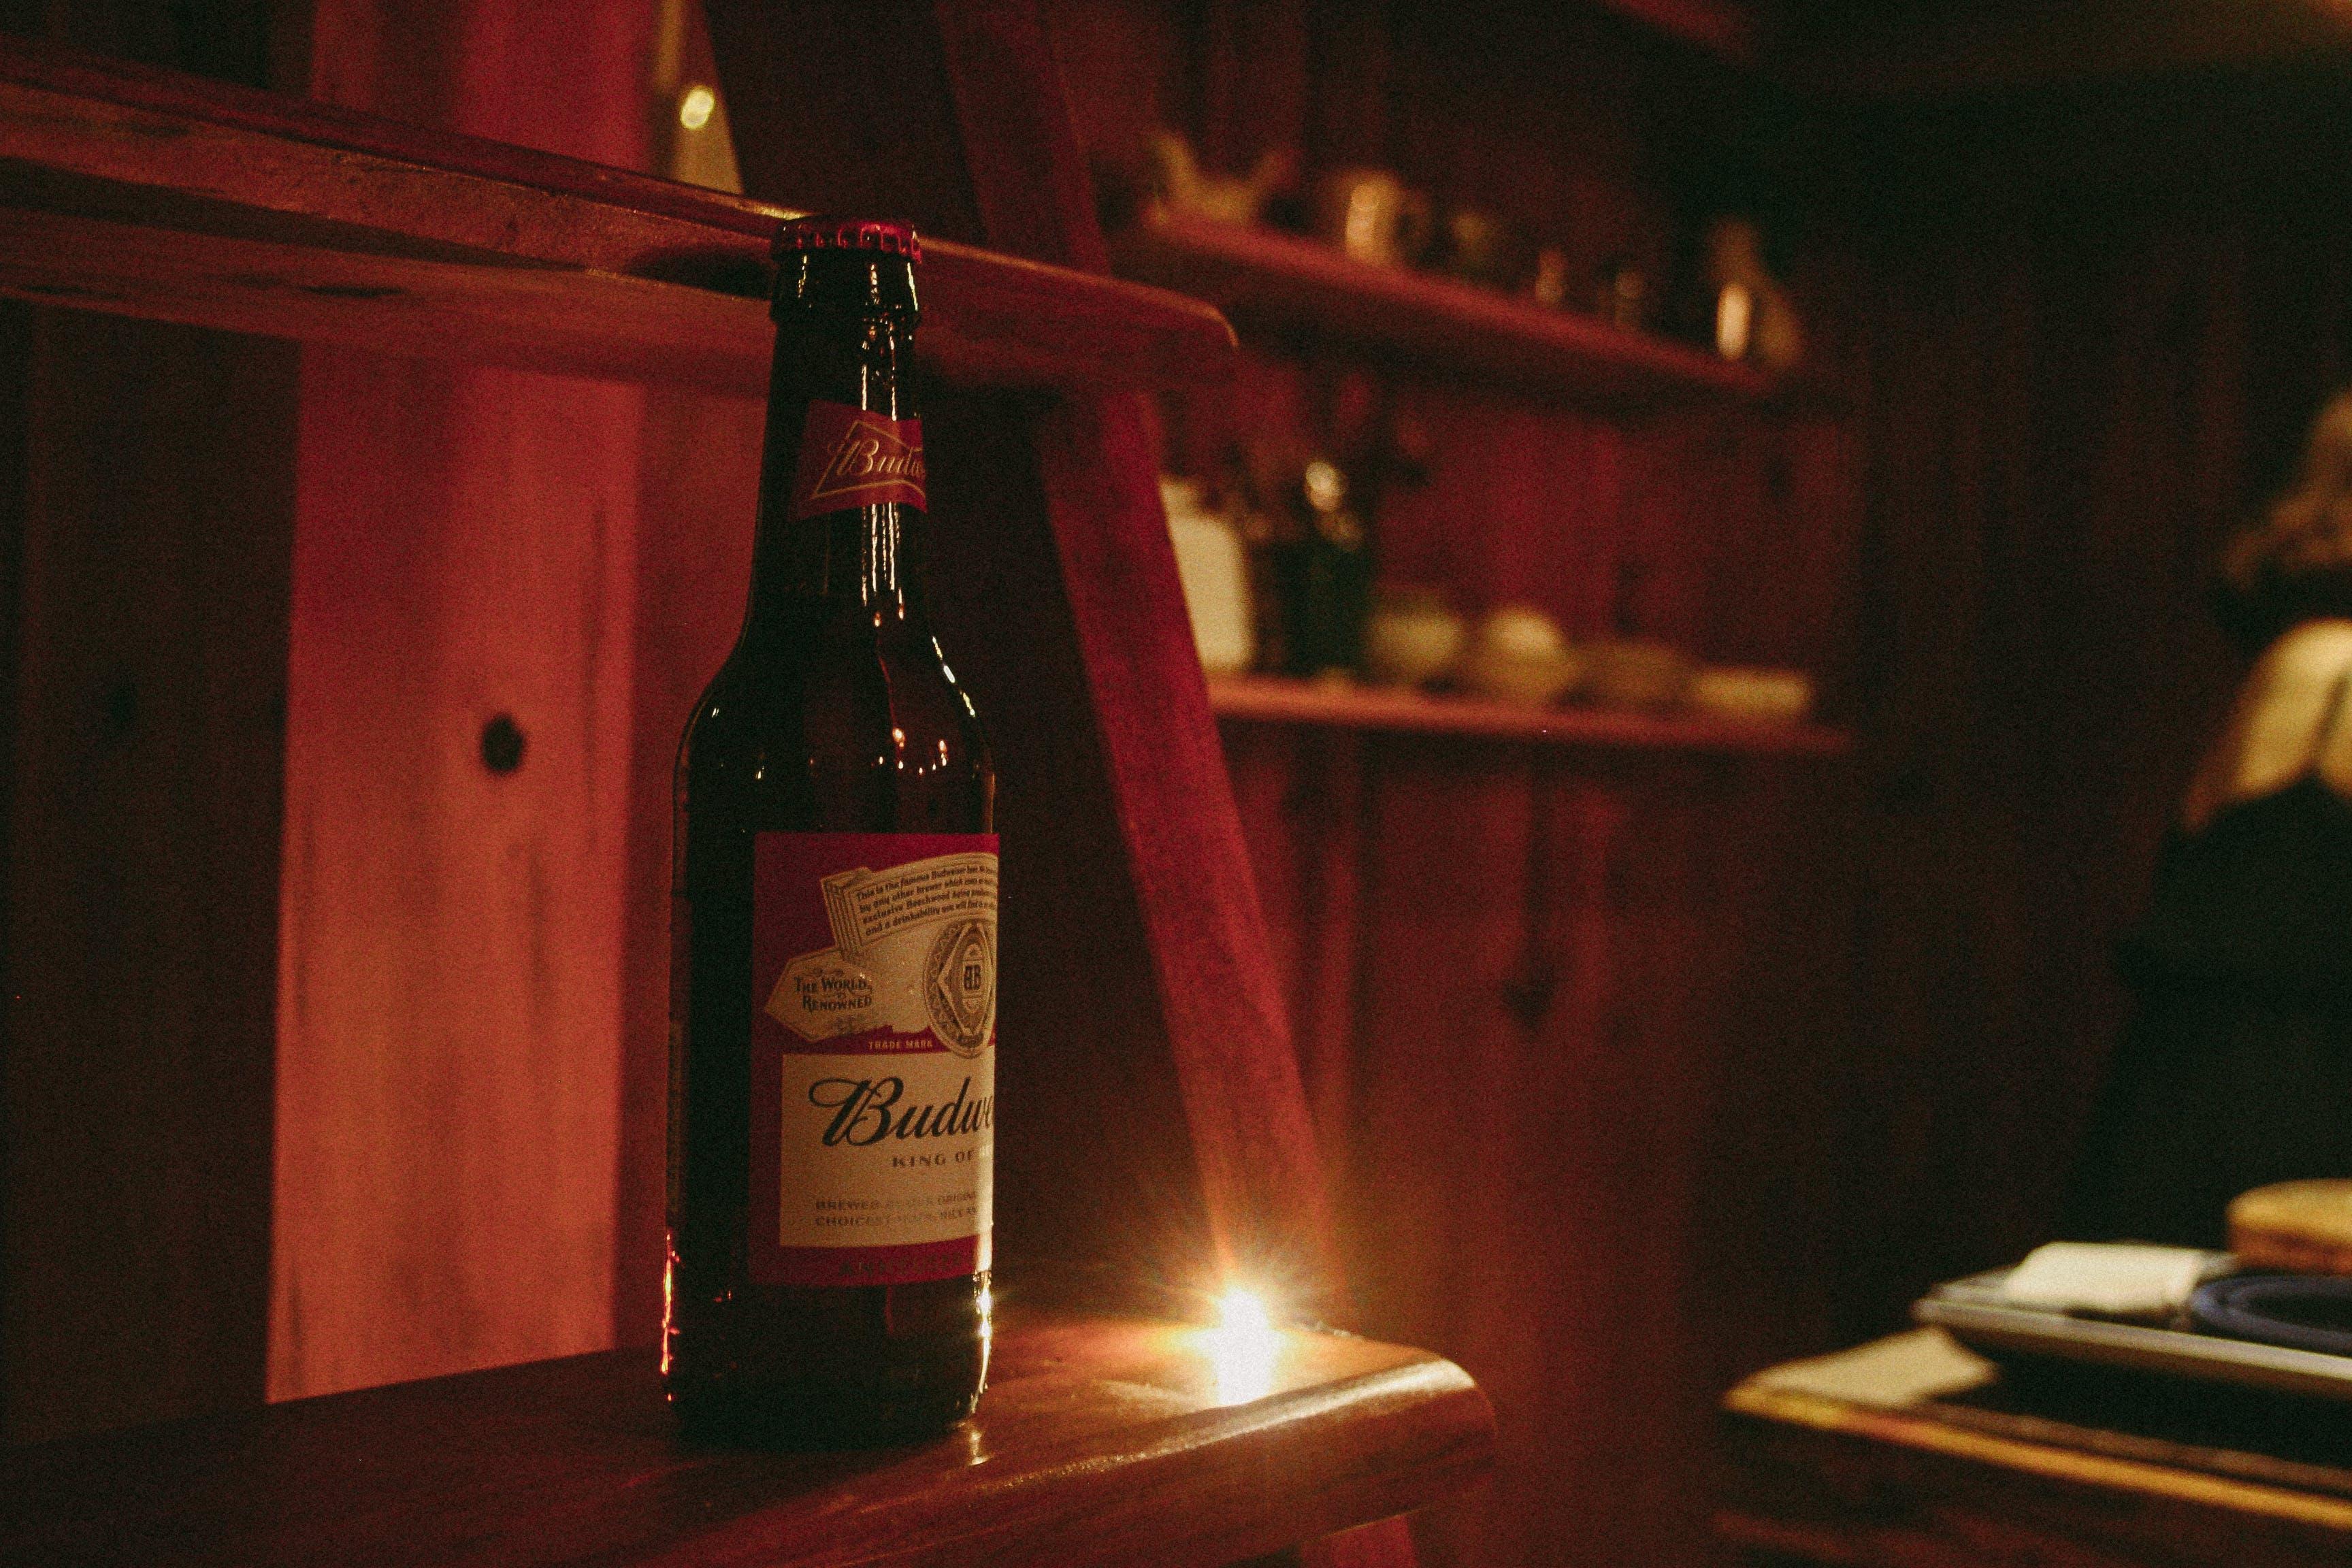 Free stock photo of beer, beer bottle, stair, wooden